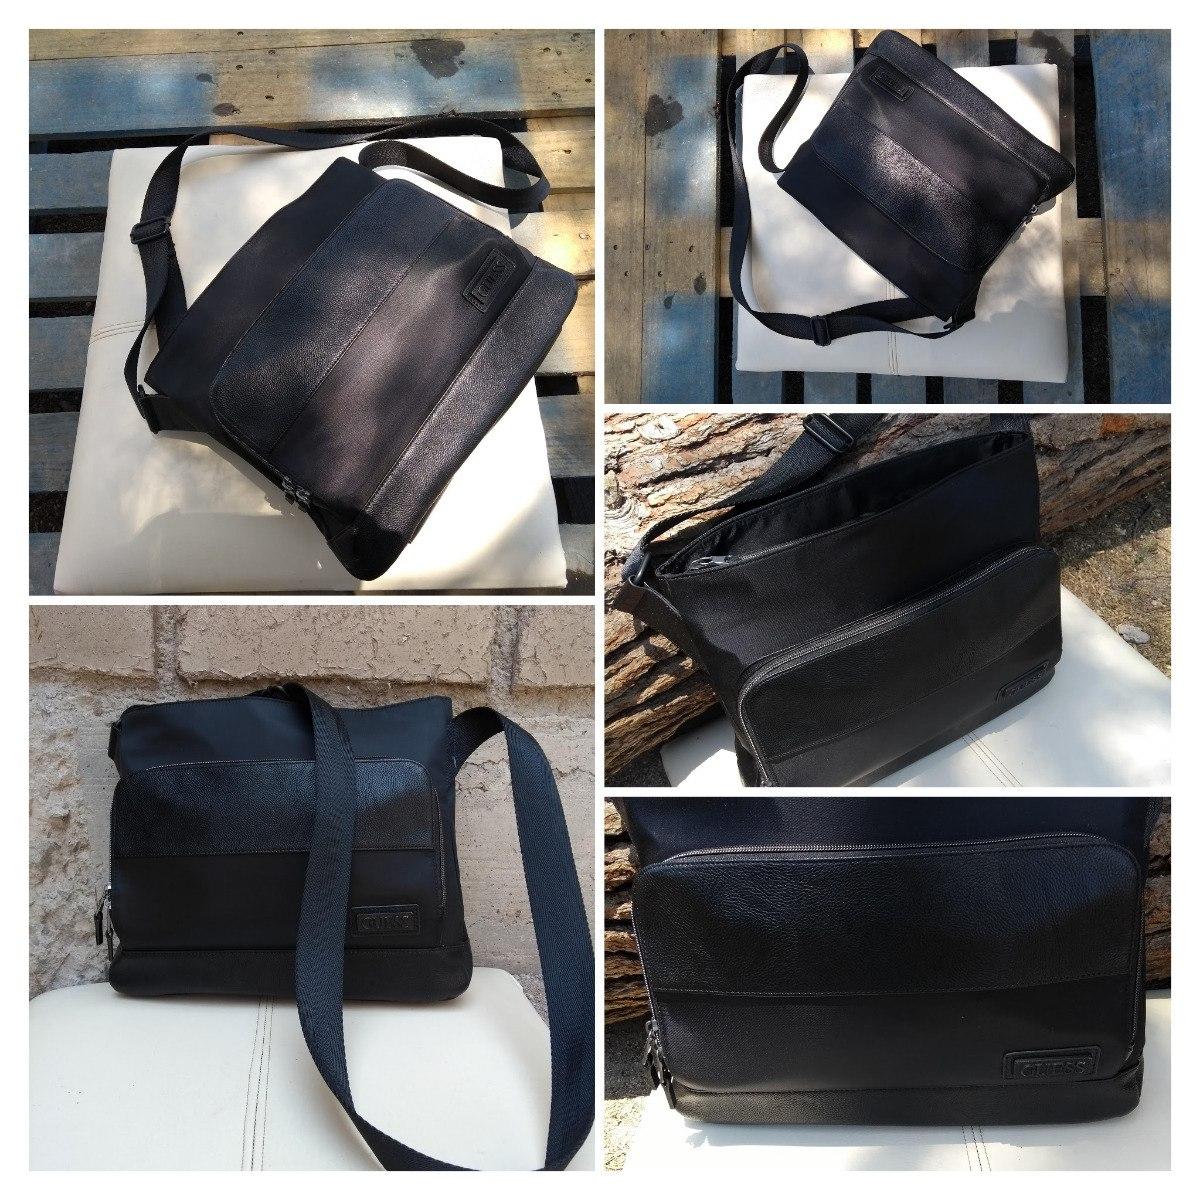 52eb216cb Bolso Porta Tablet - Mensajero Negro Outlet Guess - $ 900.00 en ...